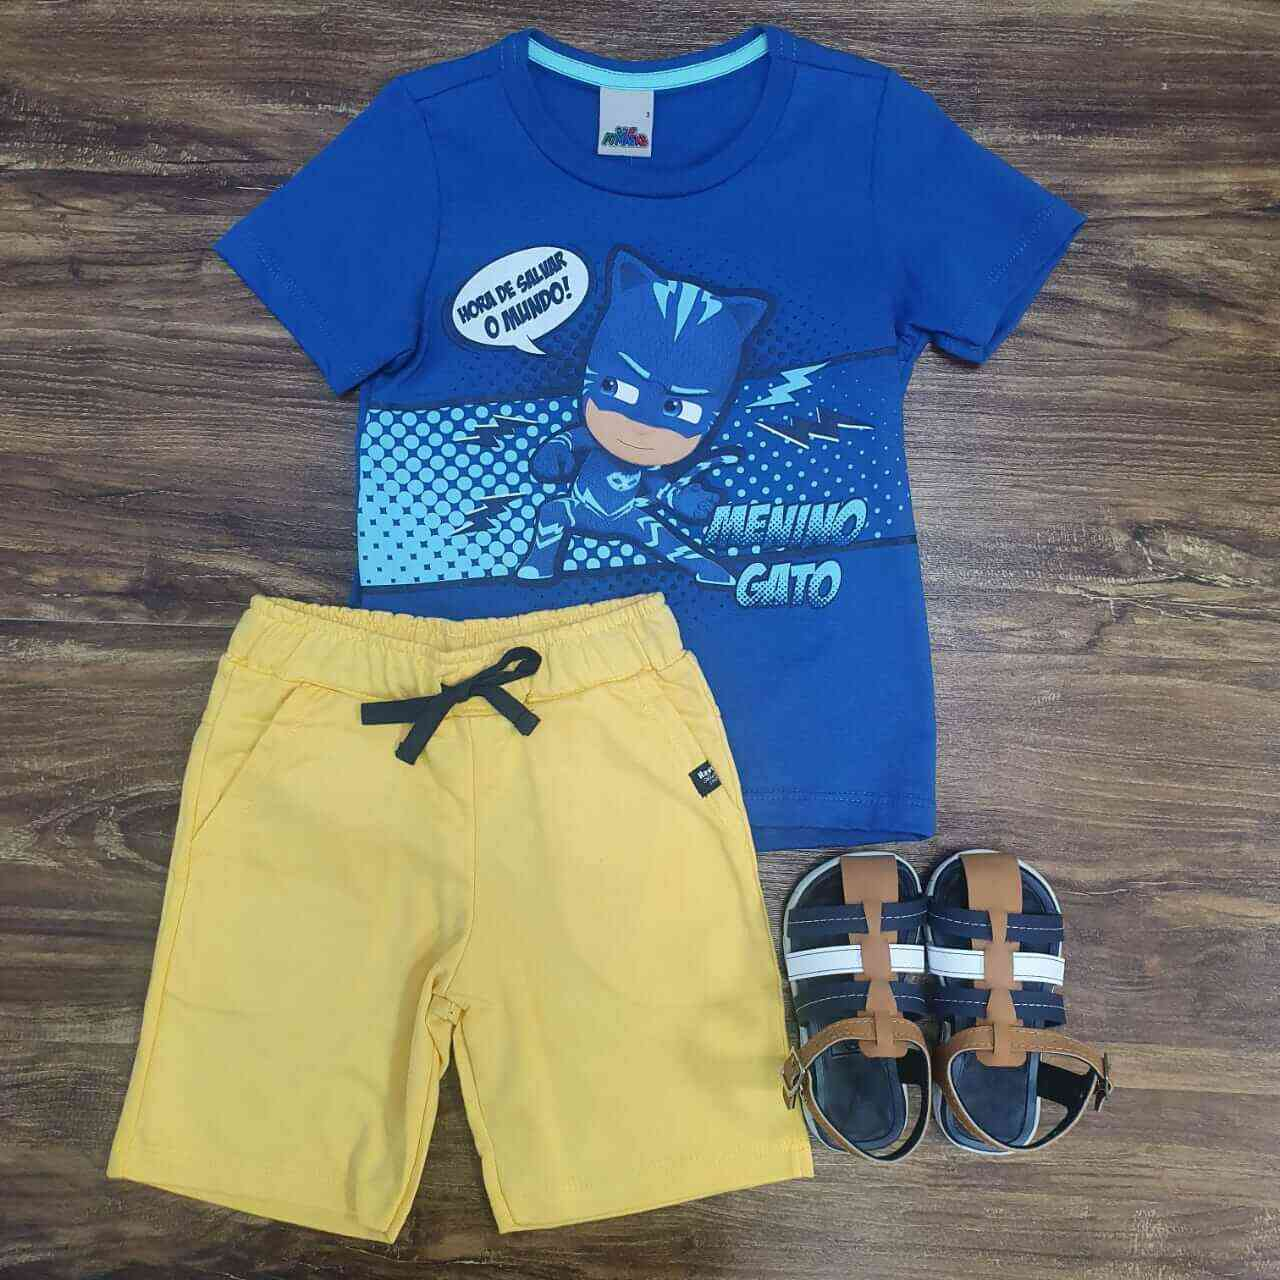 Bermuda Amarela com Camiseta Pj Masks Azul Infantil